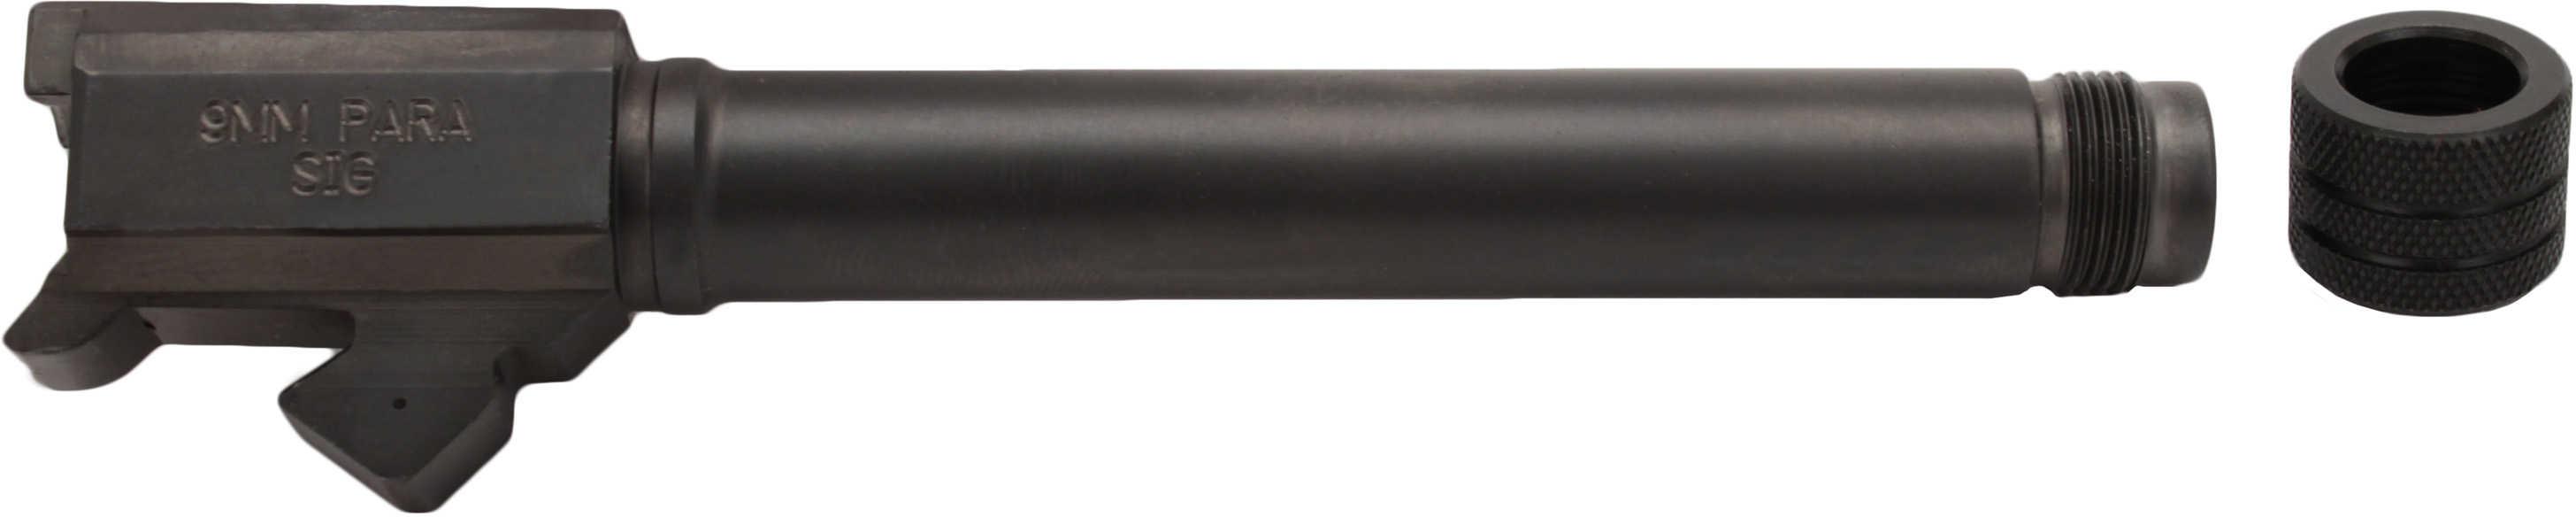 Sig Sauer Barrel 9MM Link/Pin/Bushing Threaded P226 Bbl-226-9-T